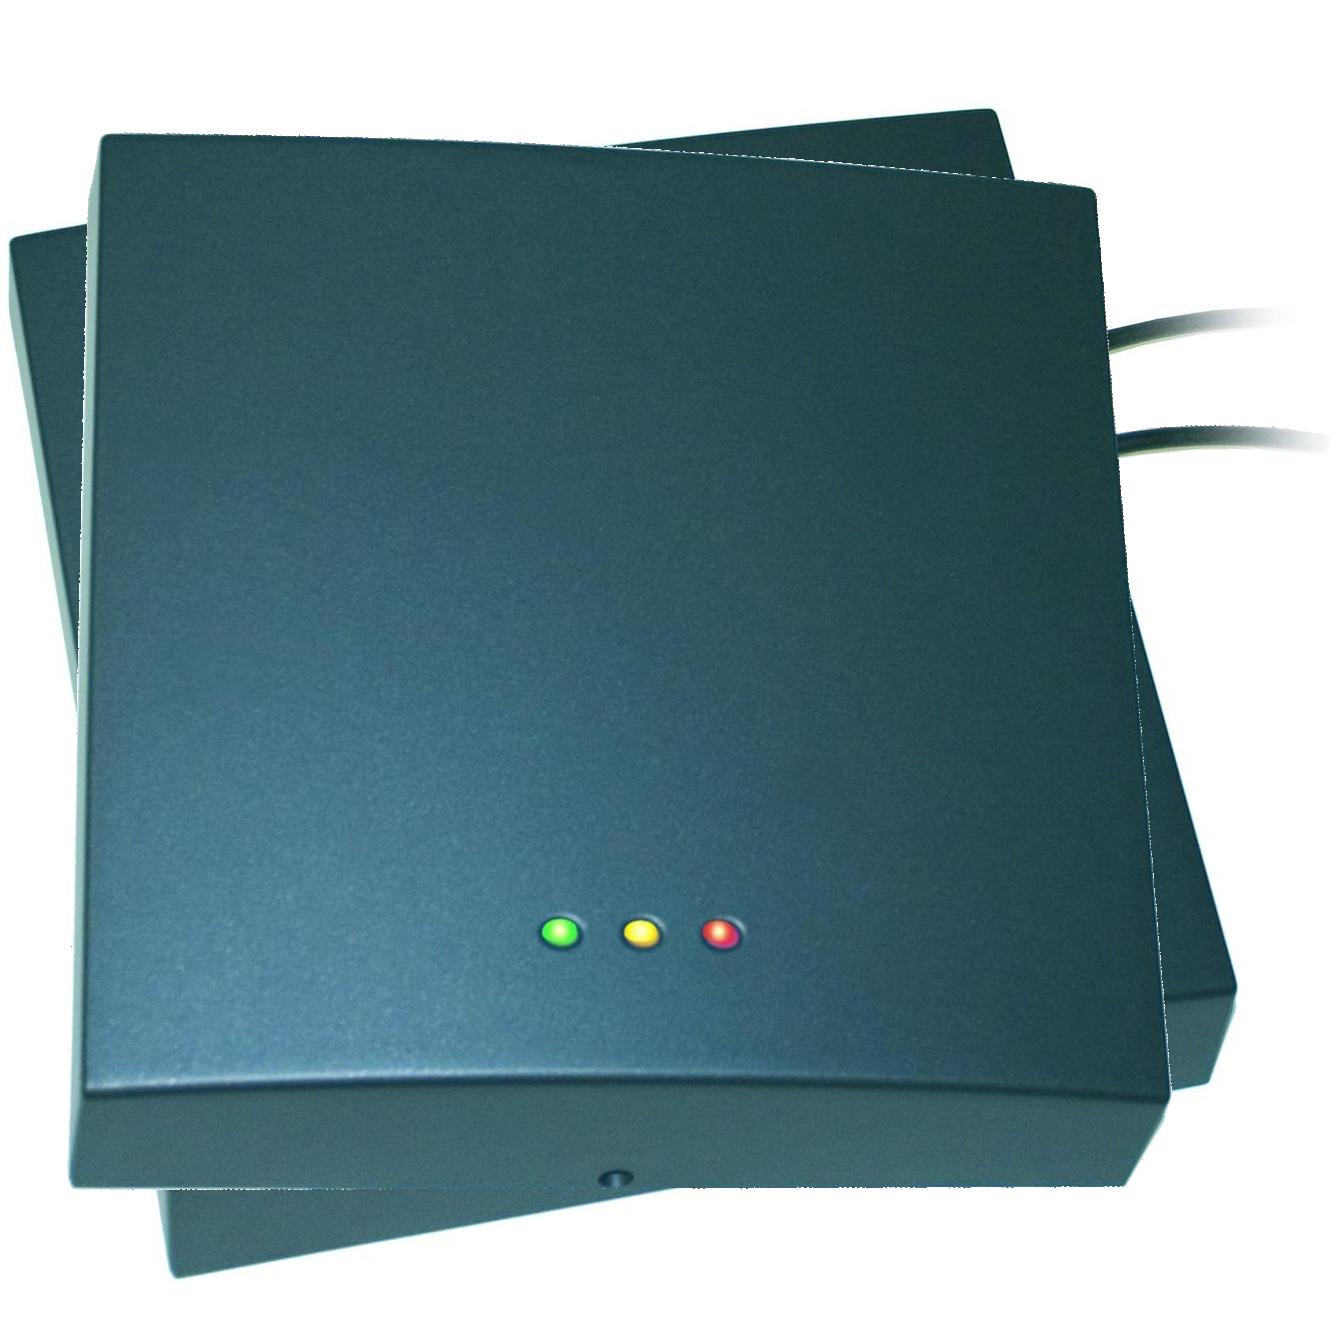 Paxton 324-110 Net2 P200E Proximity Reader Metal Mount